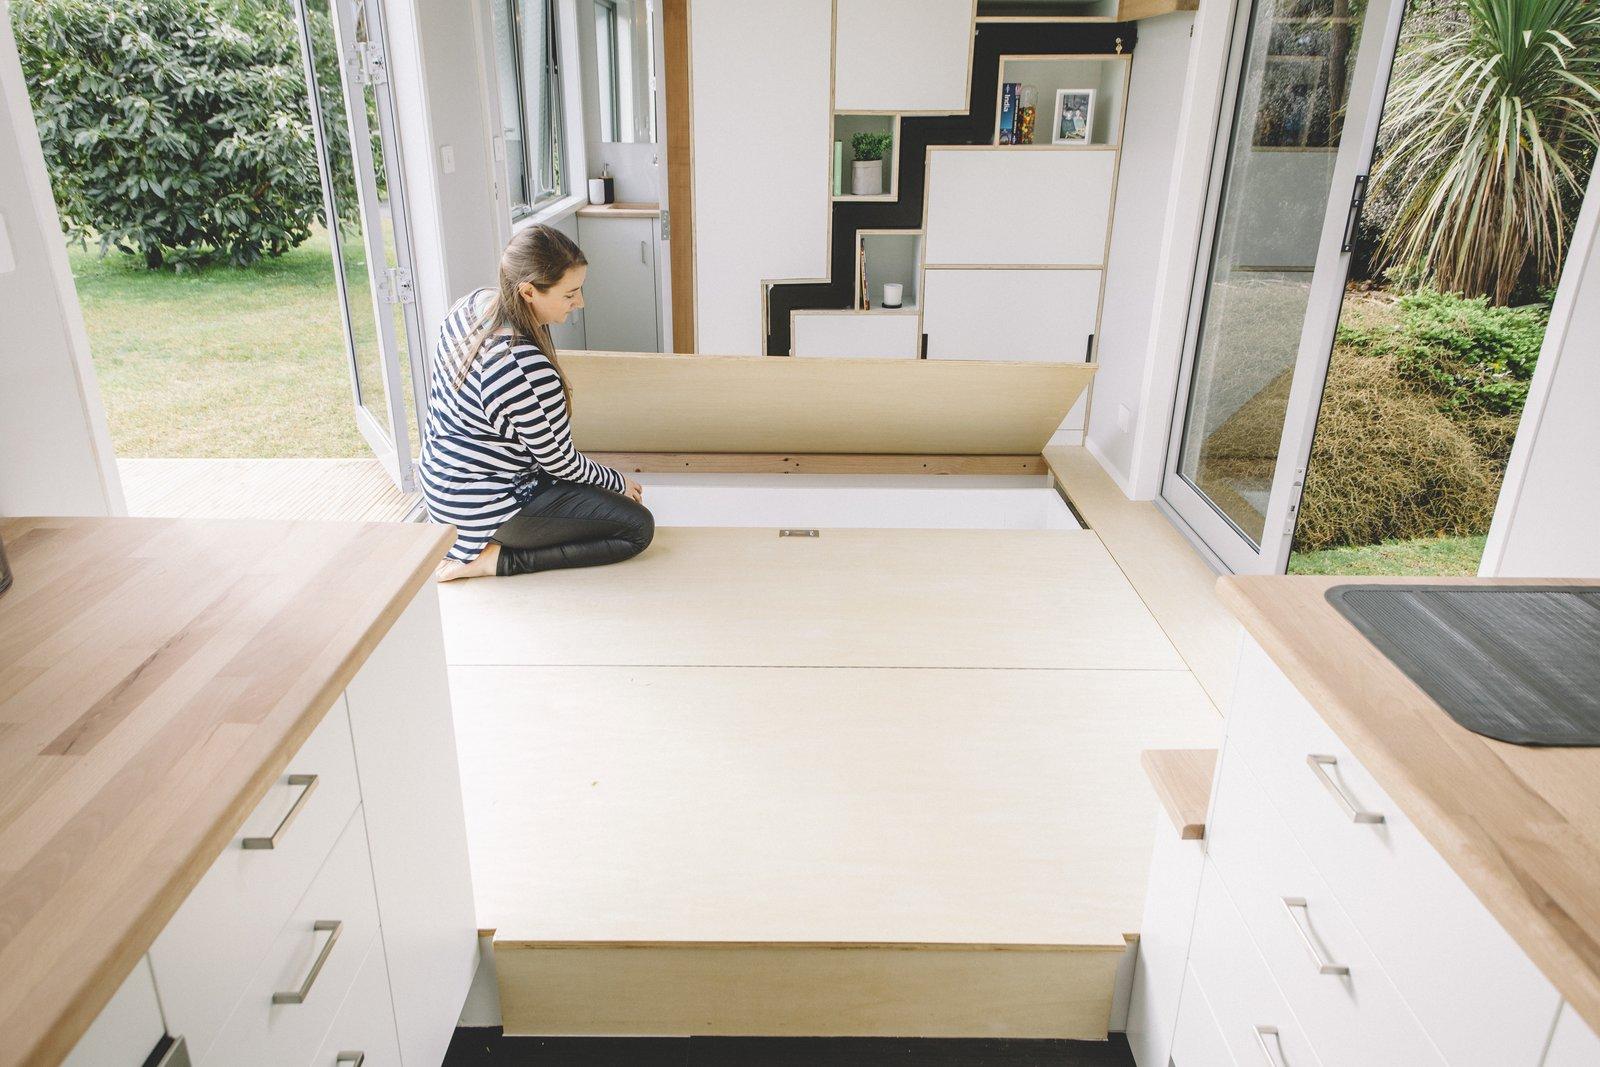 Millennial Tiny House underfloor storage